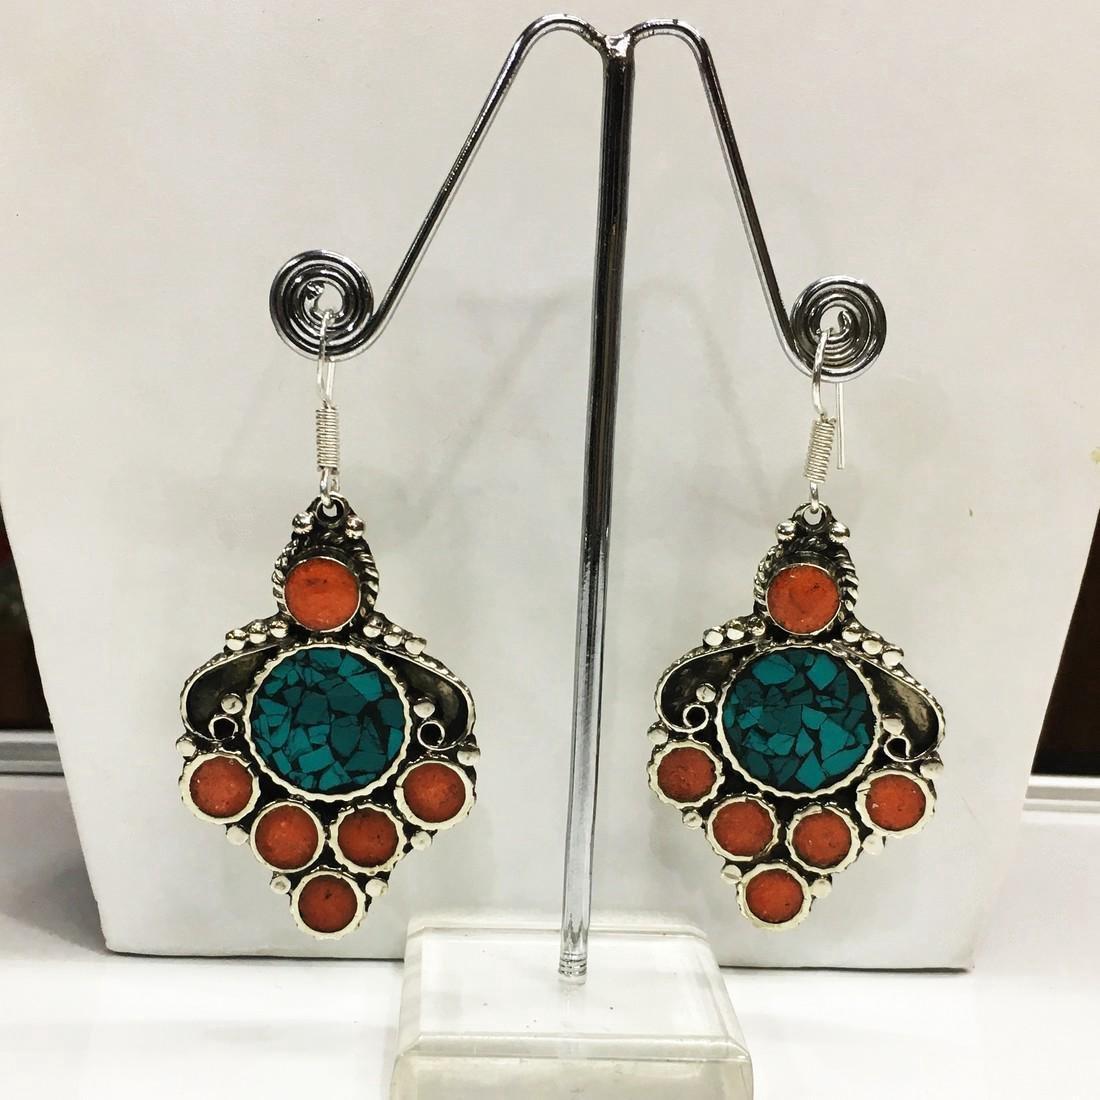 Vintage Ethnic Tibetan Silver Turquoise Coral Earrings